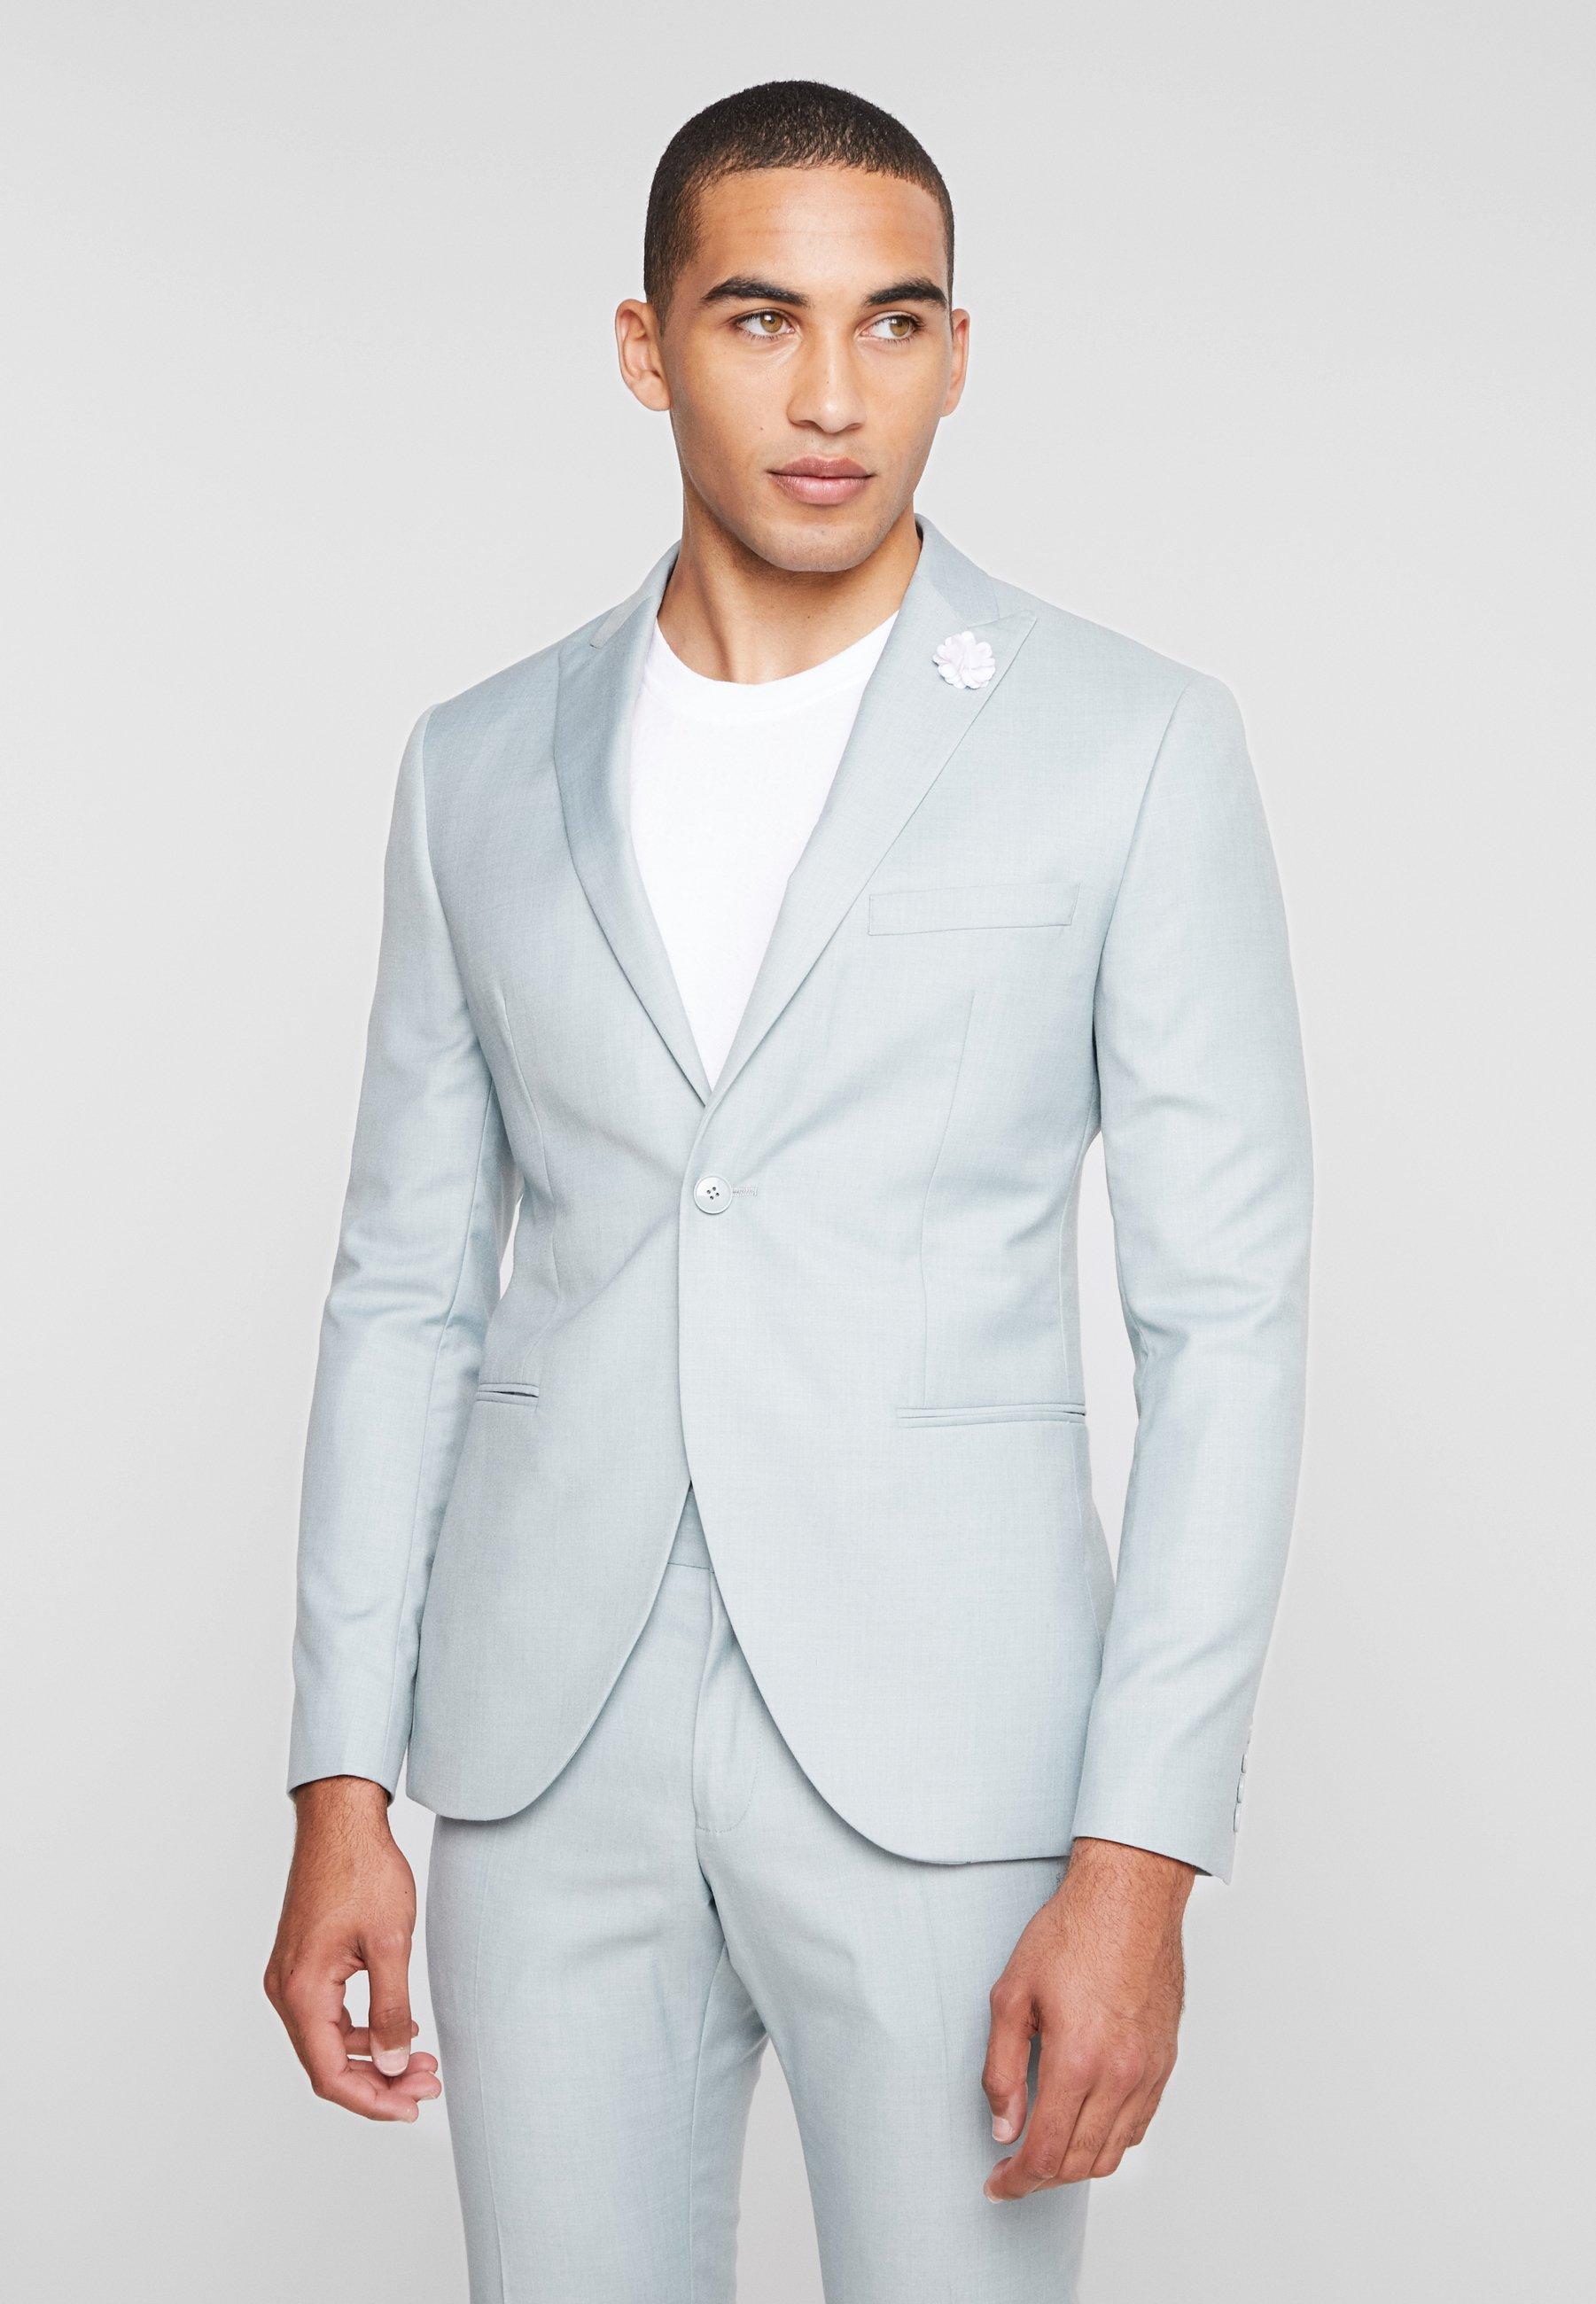 Wedding Light Green SuitCostume Isaac Dewhirst uZOkiPX